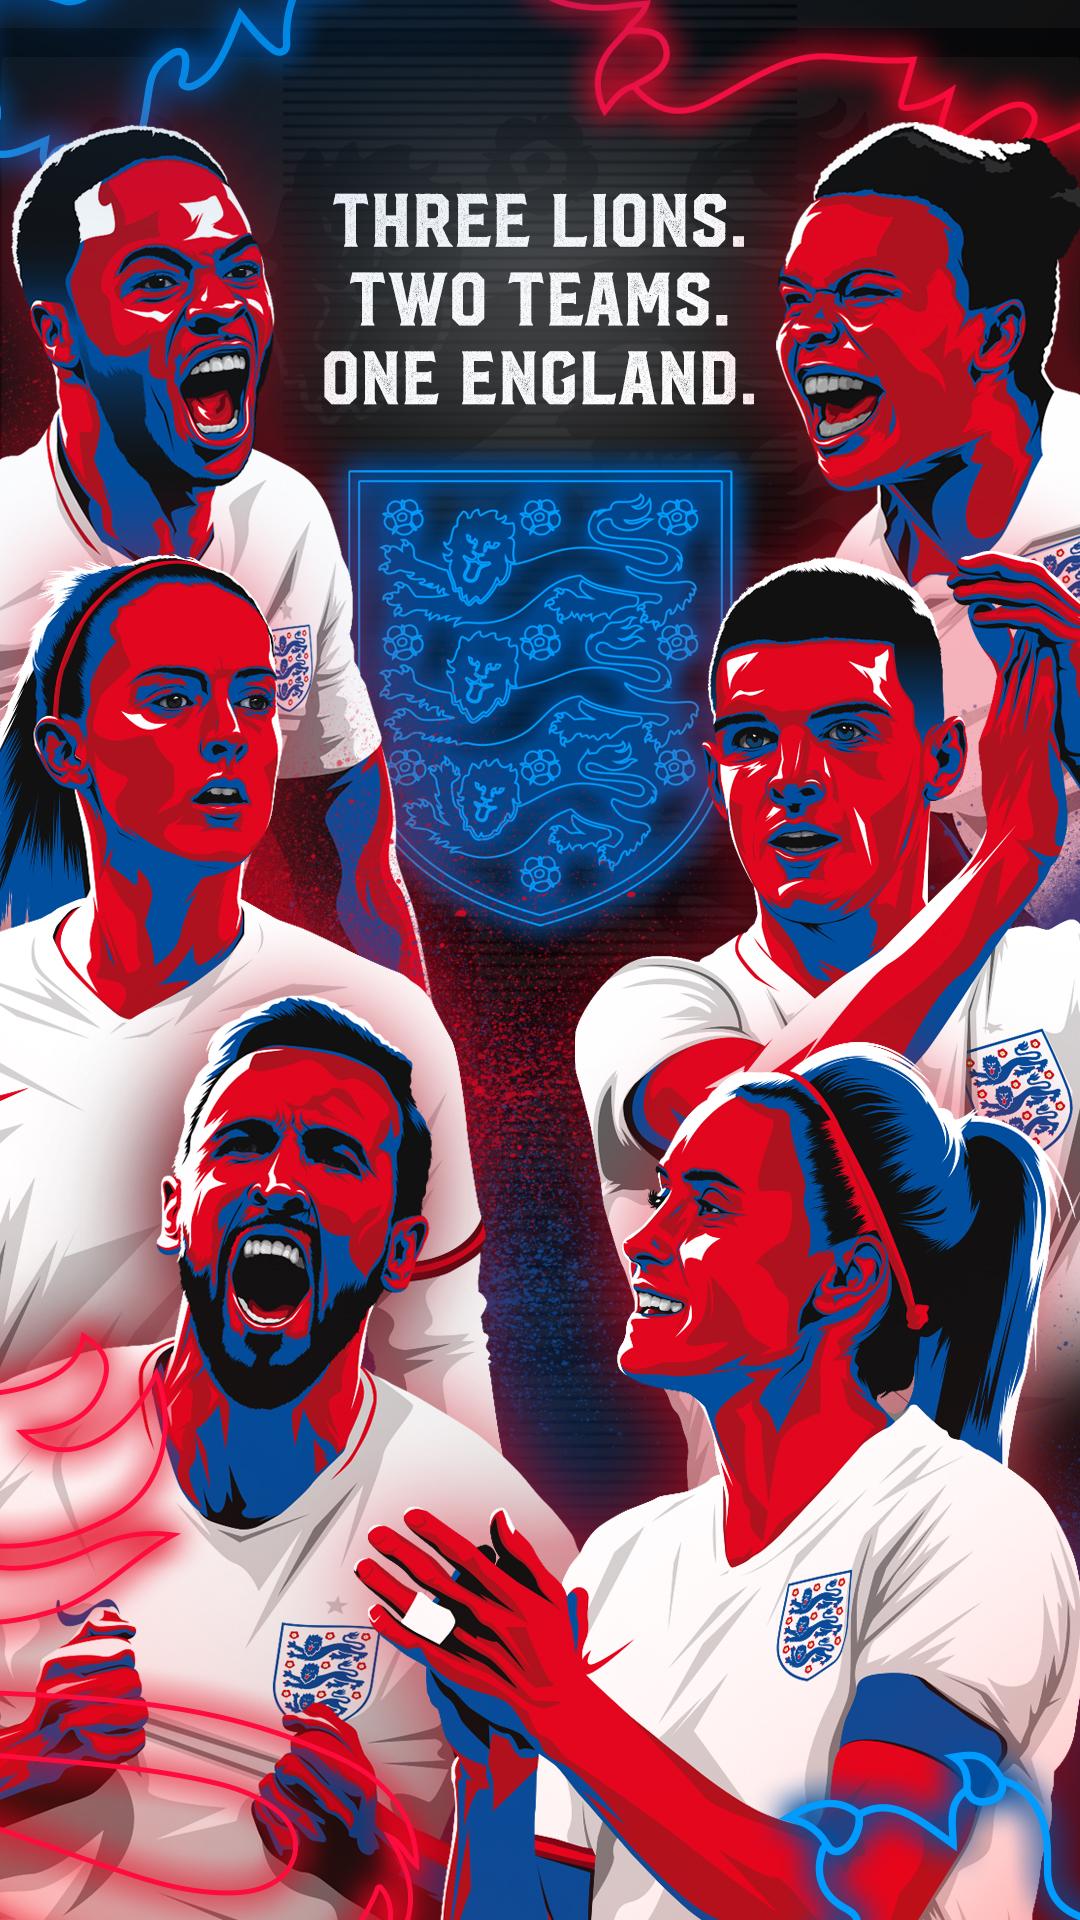 England 3 Lions 2 Teams 1 England 1080x1920